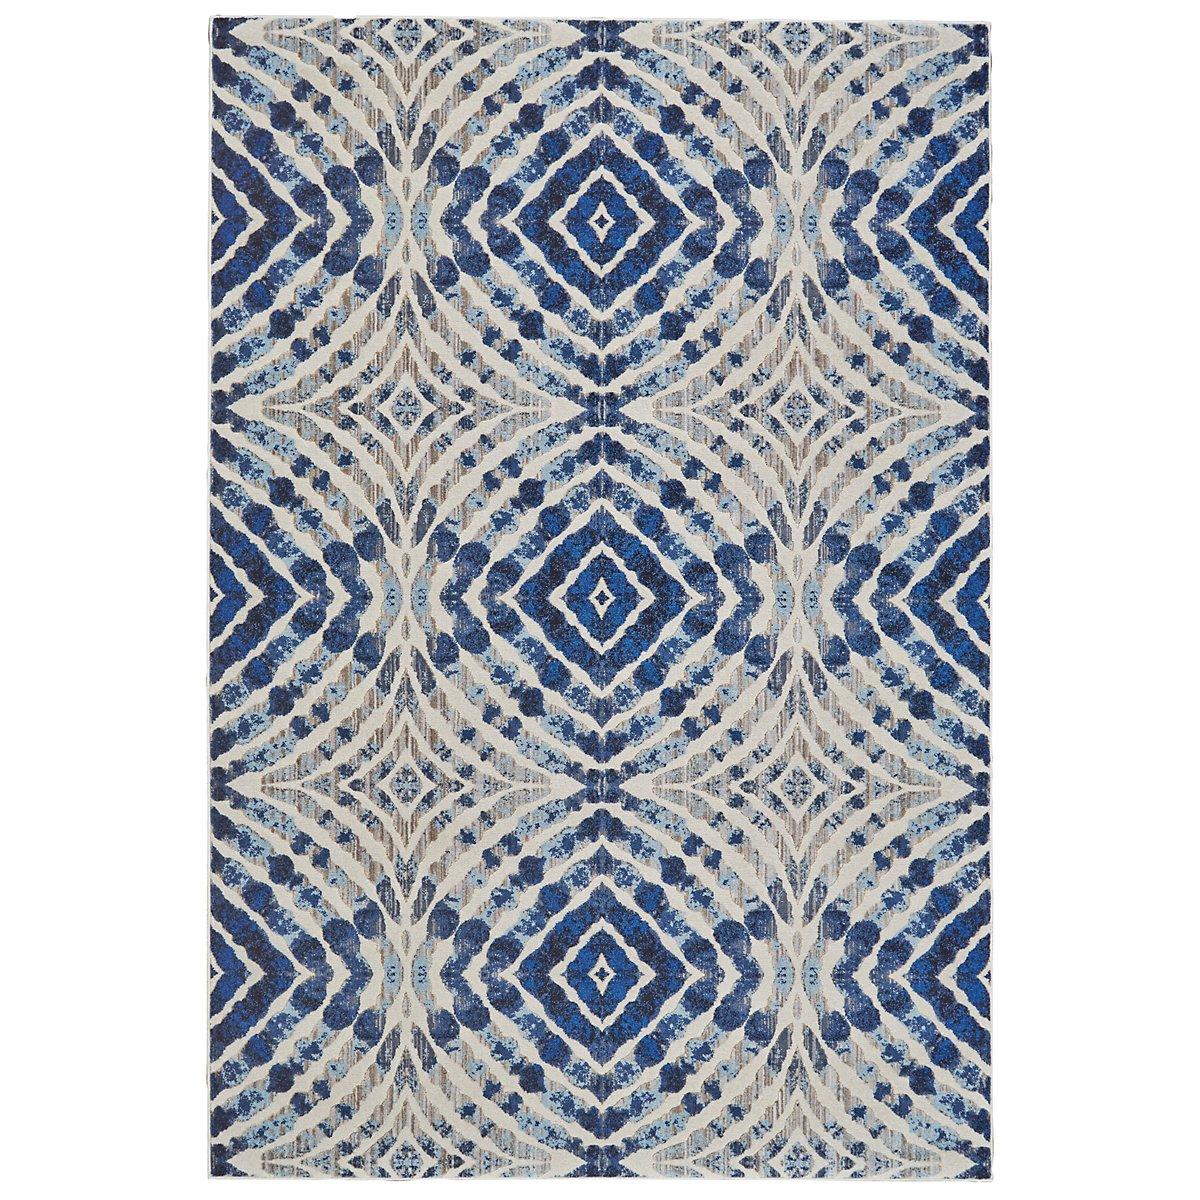 keaton dark blue 5x8 area rug. Black Bedroom Furniture Sets. Home Design Ideas